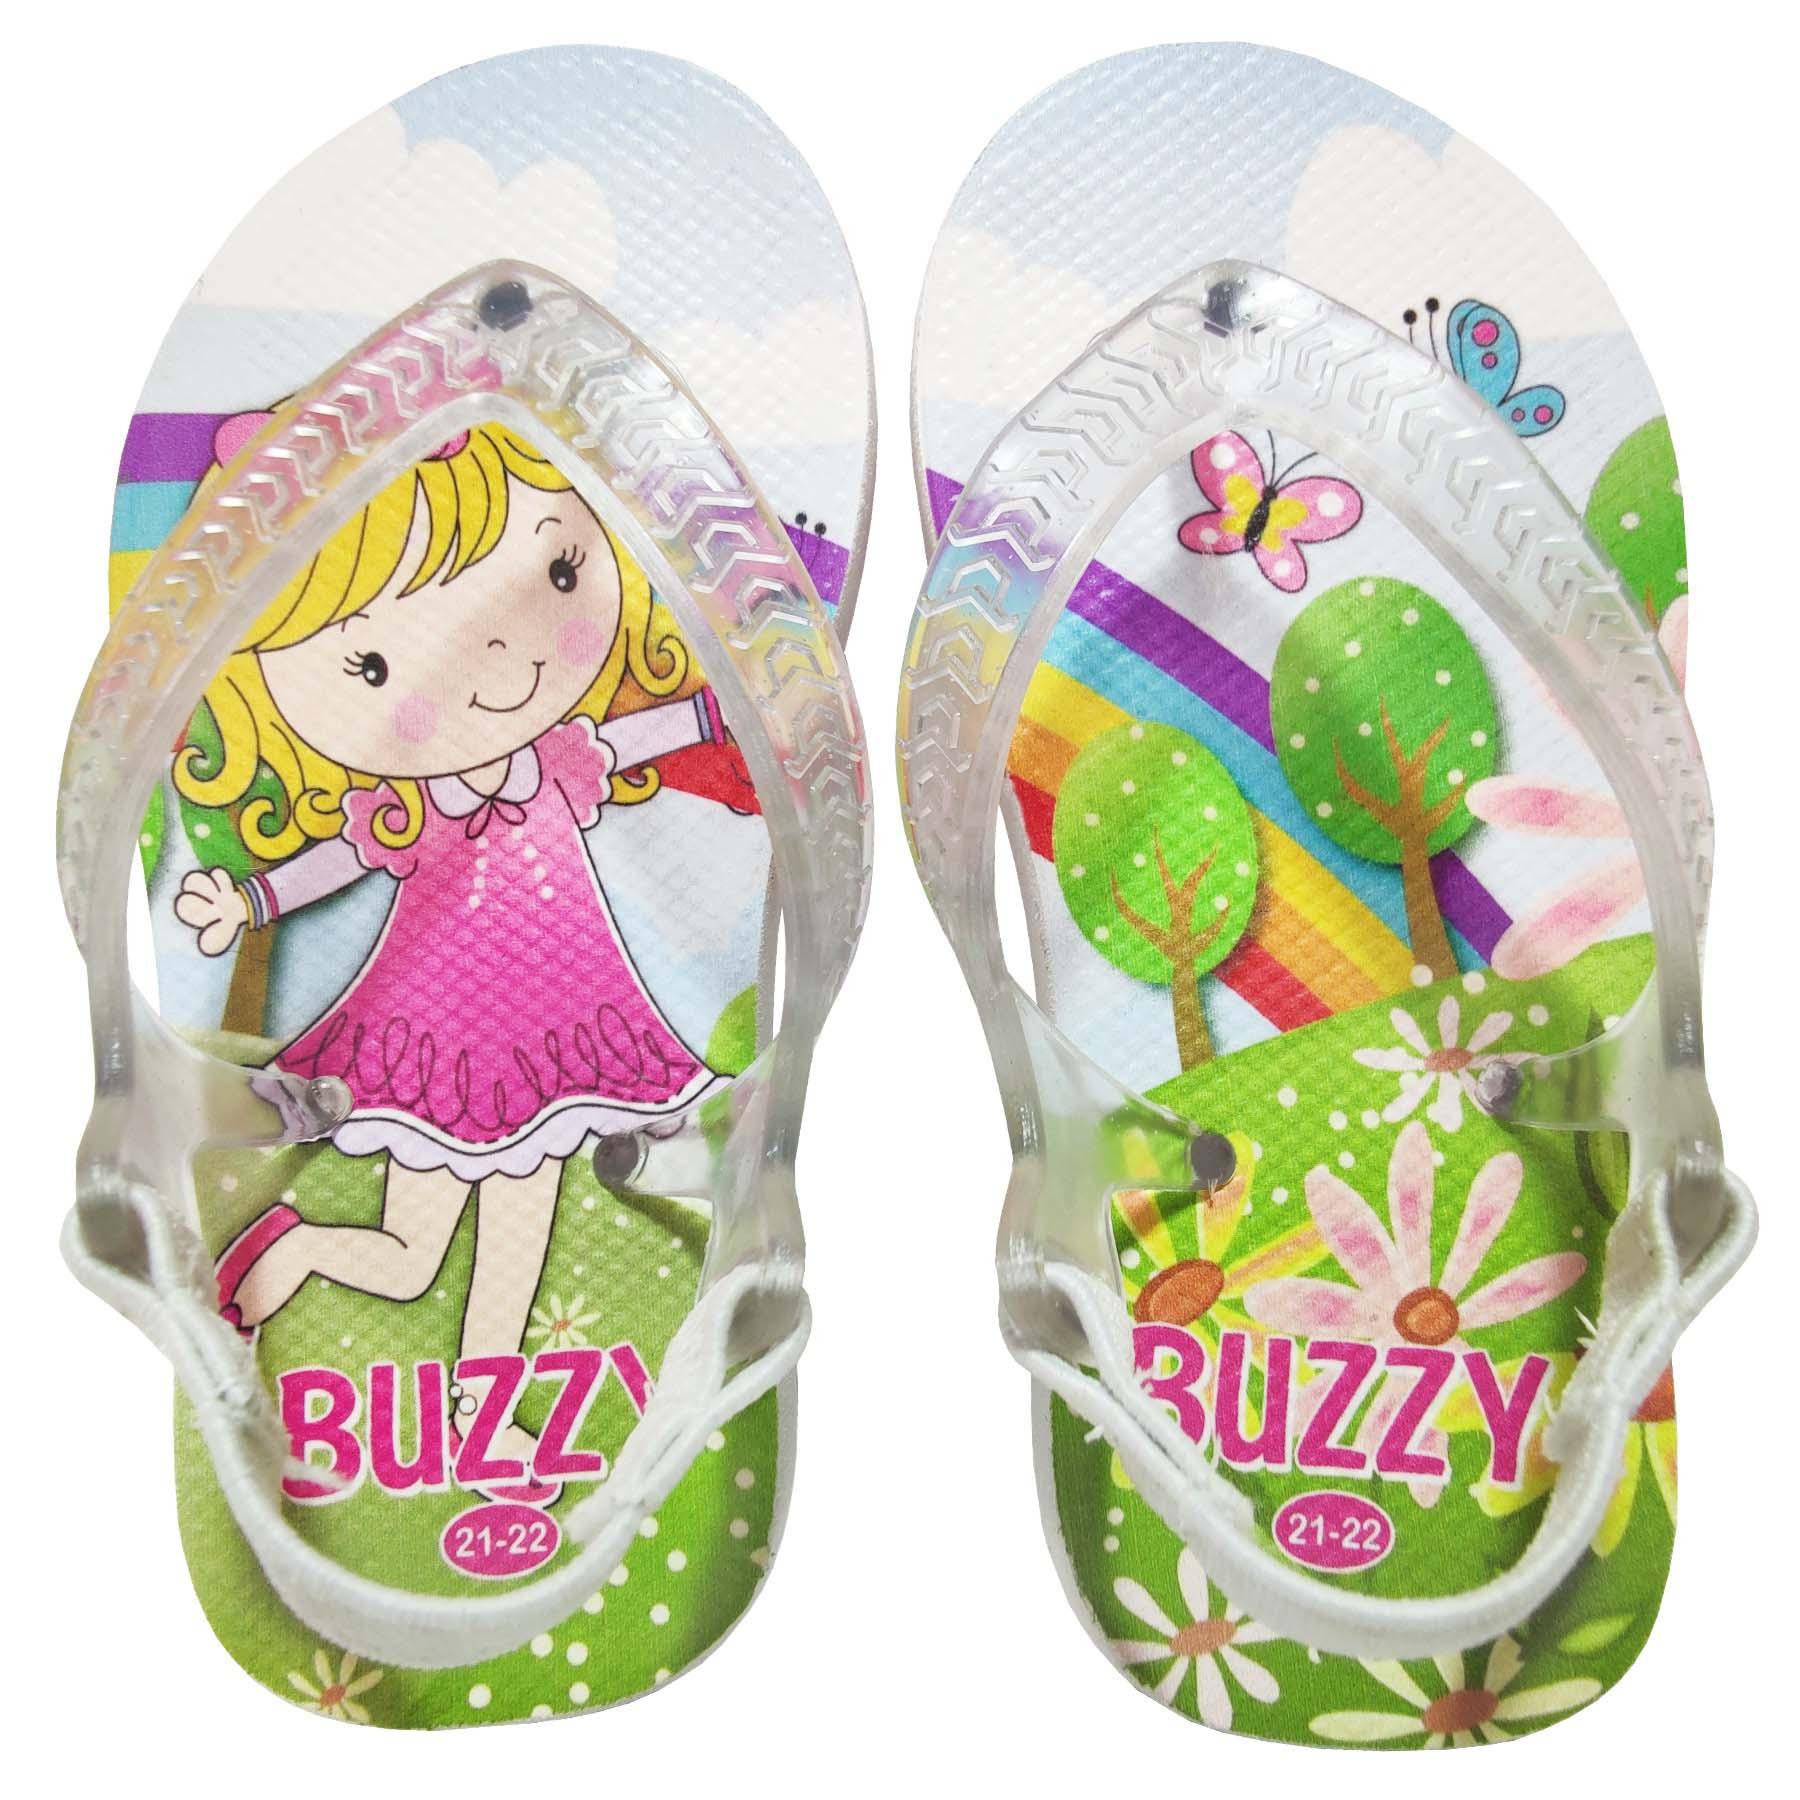 Chinelo Bebê Buzzy Sandália Infantil Menininha Meninas BZ025